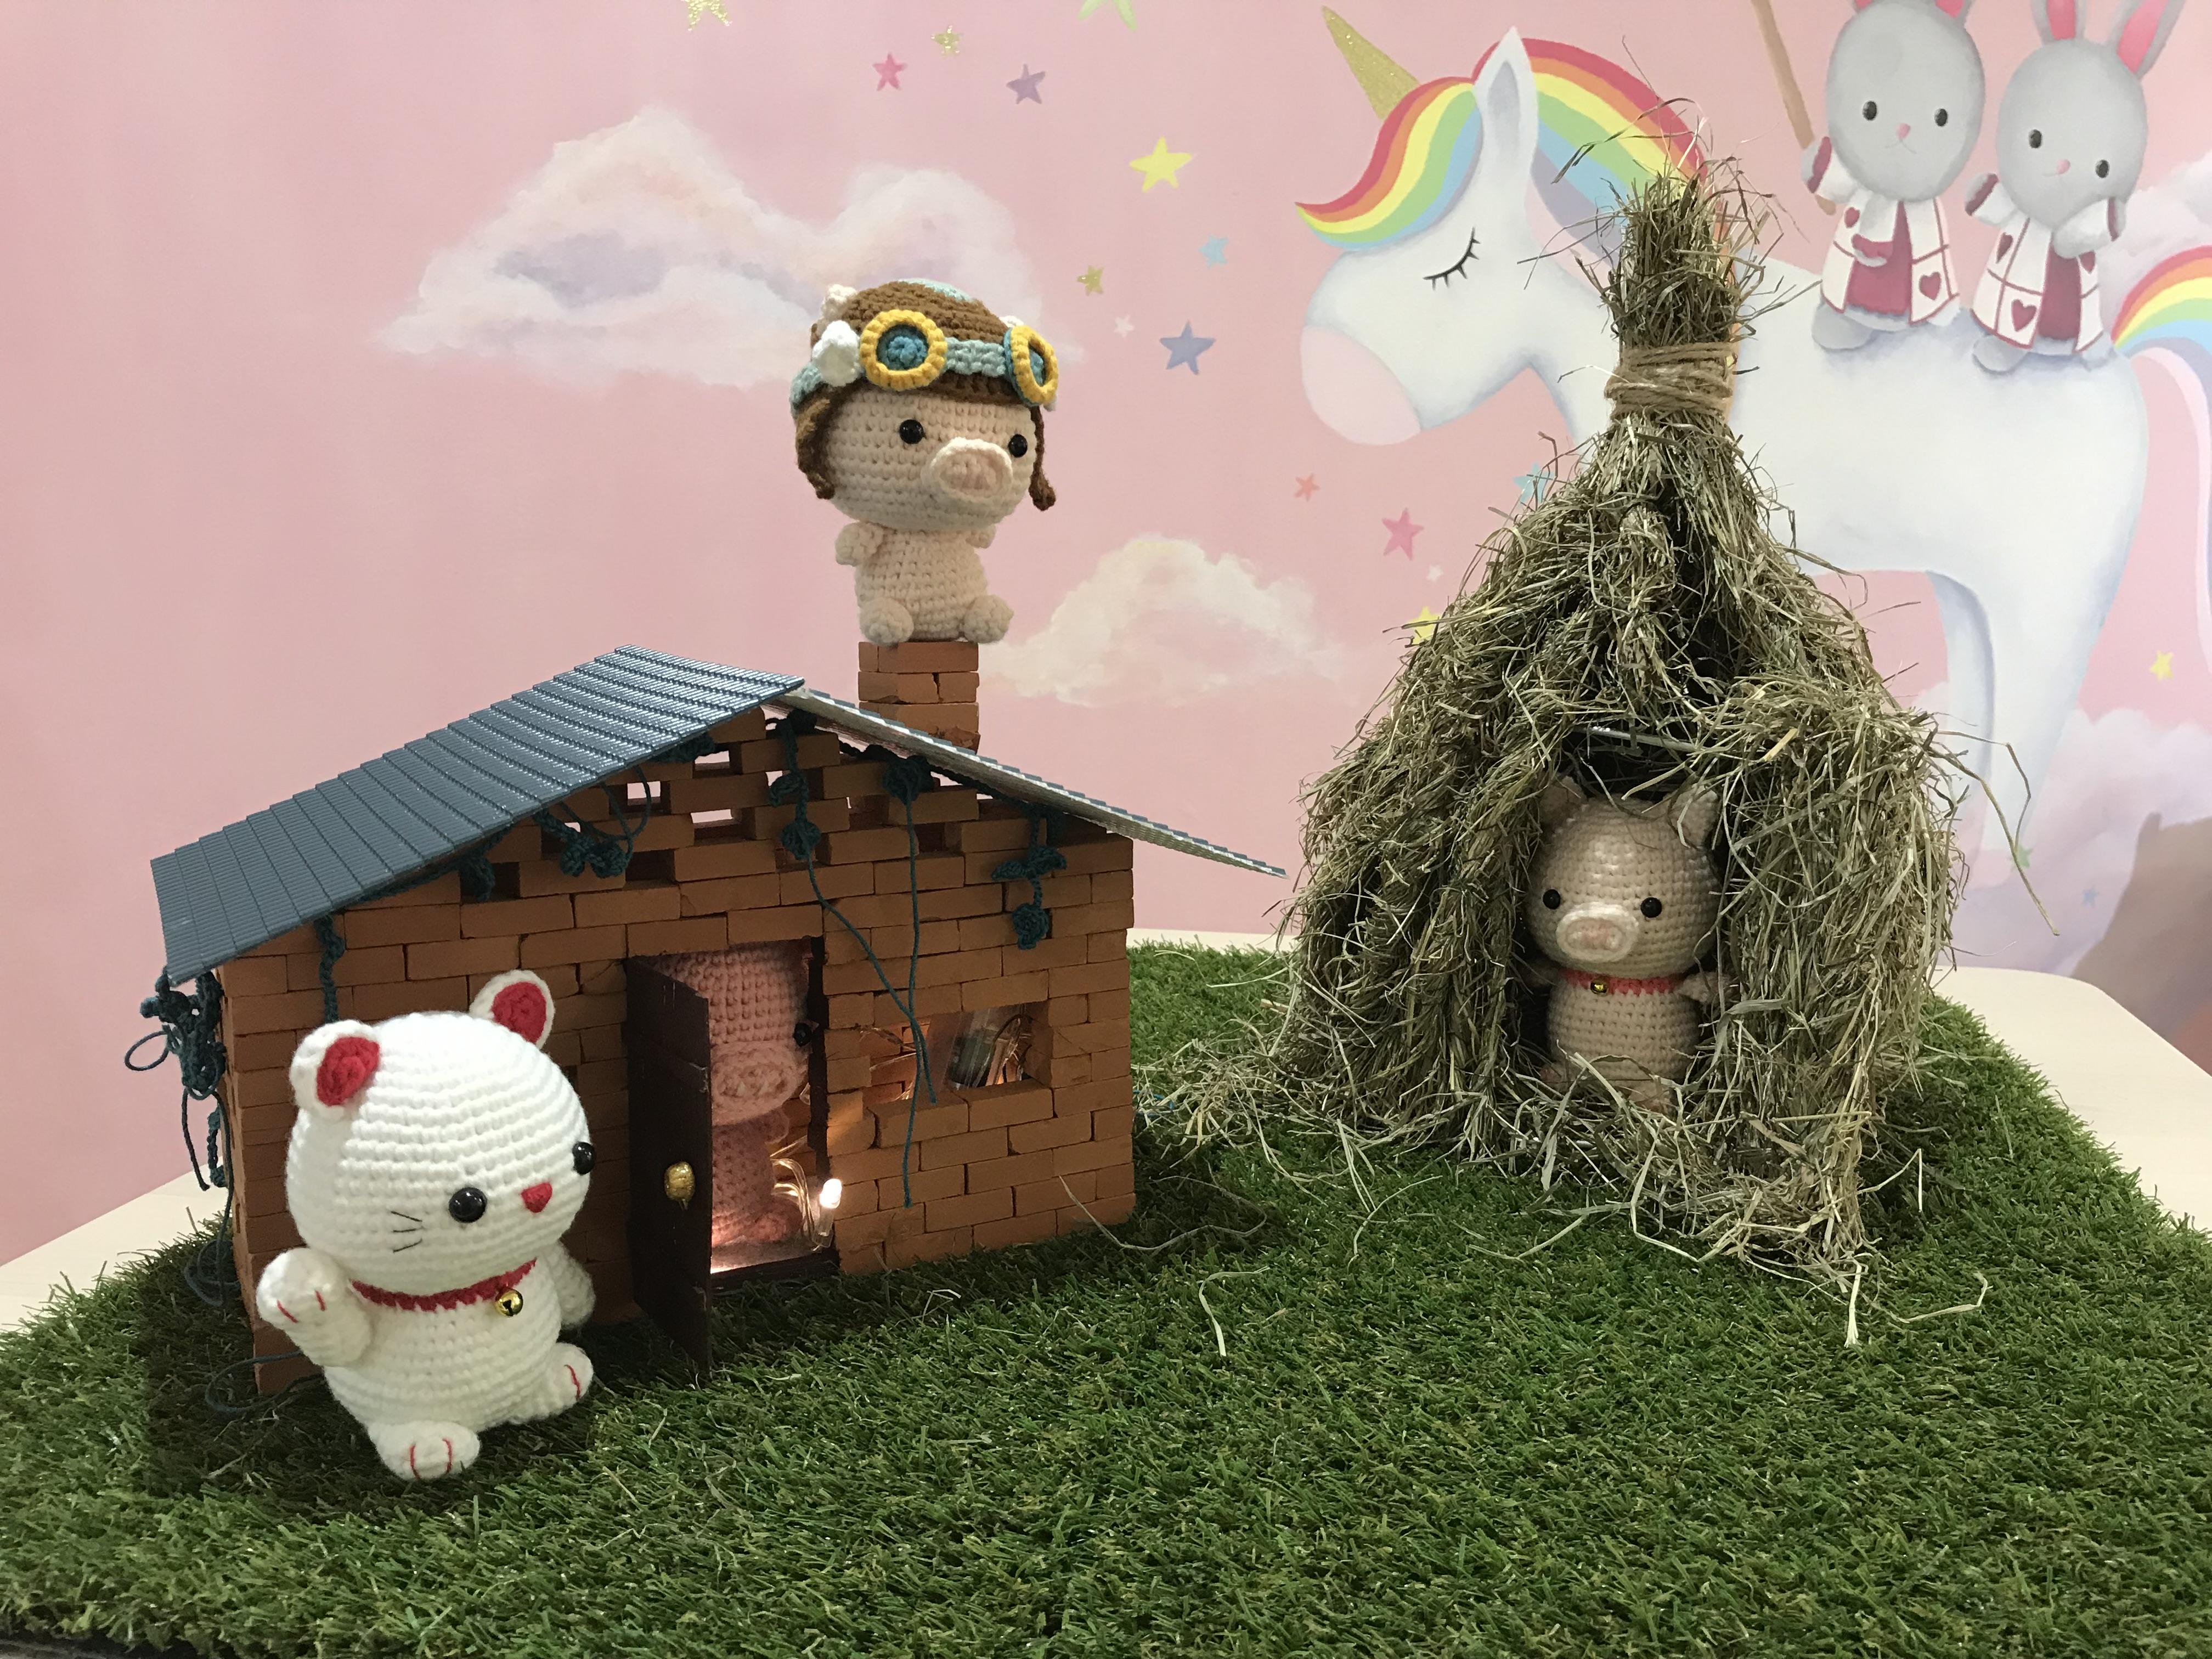 Tiny Rabbit Hole – Three Little Pigs Amigurumi Crochet Chinese New Year 2019 Aviator Lucky Pig Cat Maneki Neko straw house brick house fly